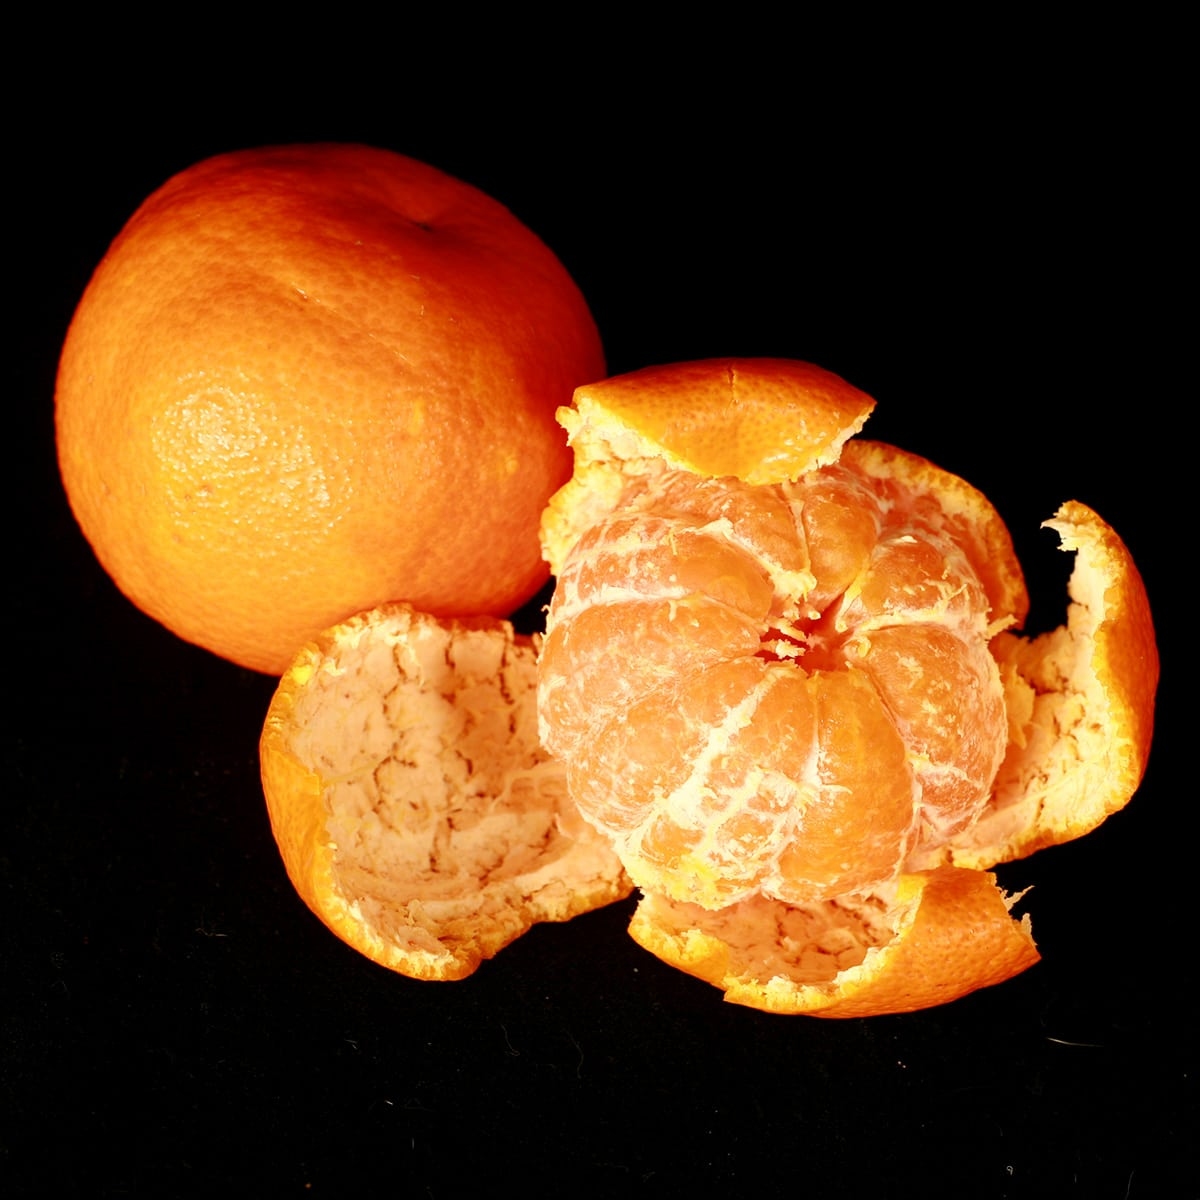 2 California Satsuma oranges, one peeled.